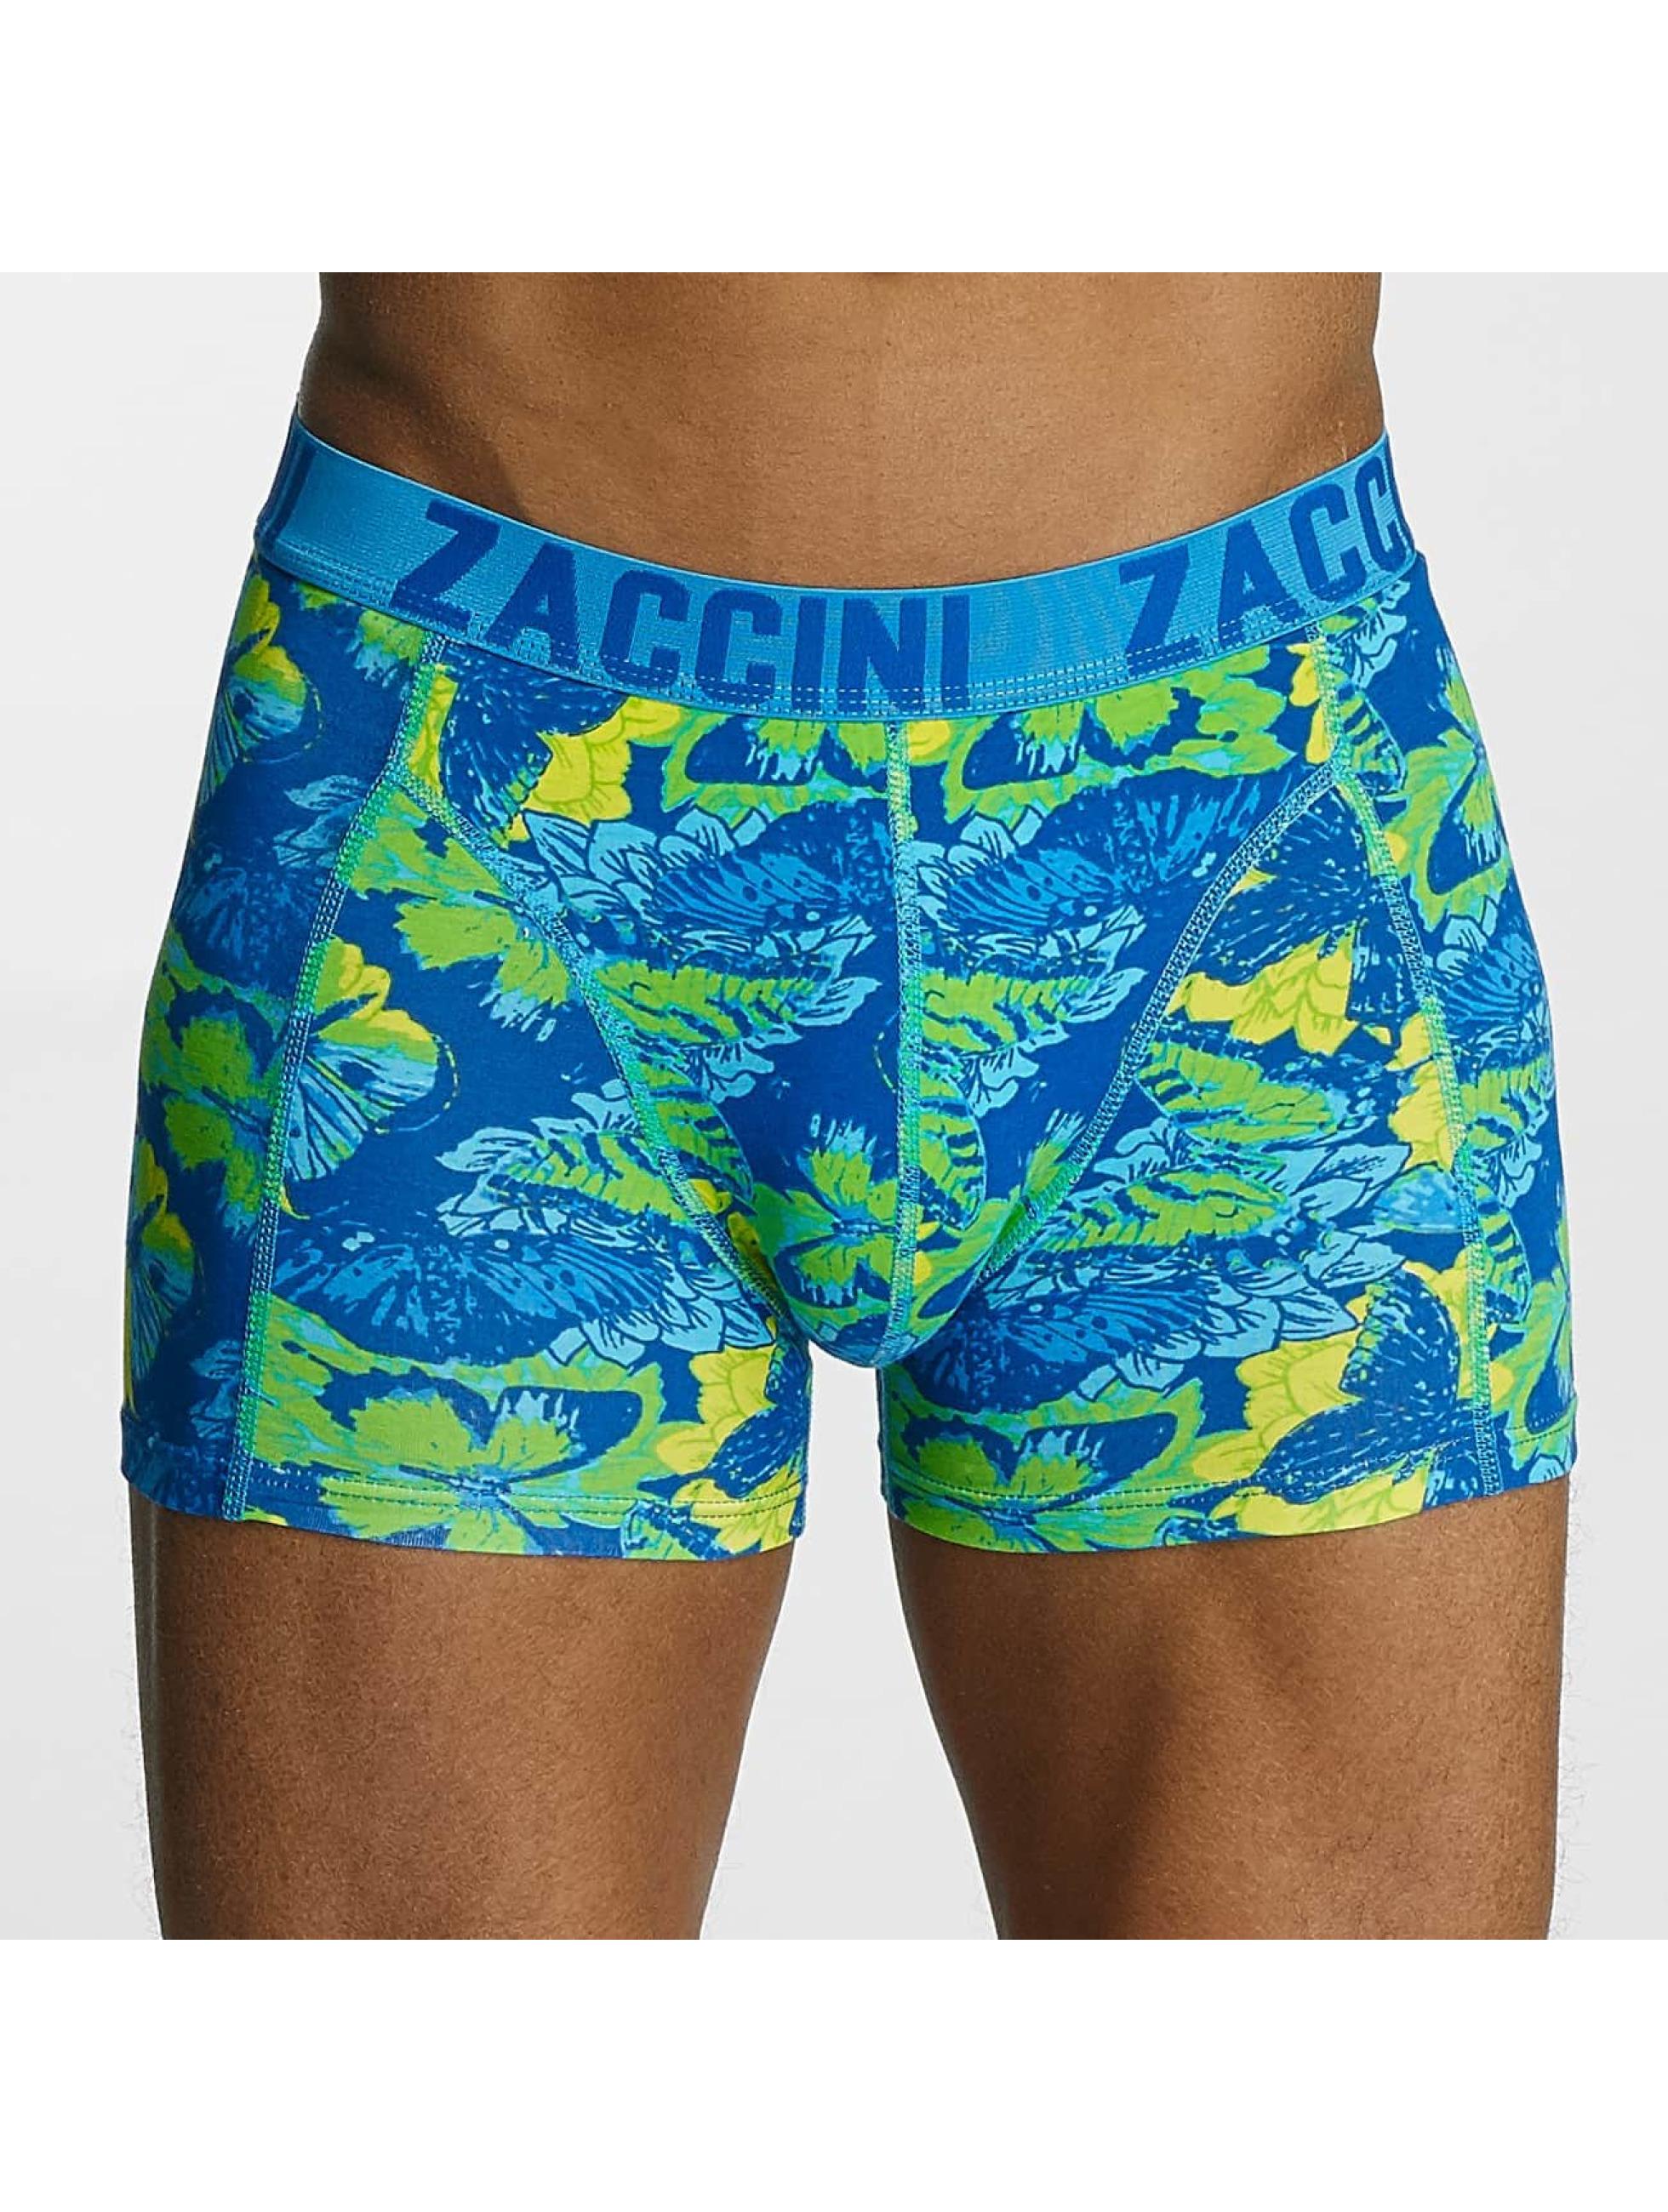 Zaccini  Shorts boxeros Summer Butterfly azul